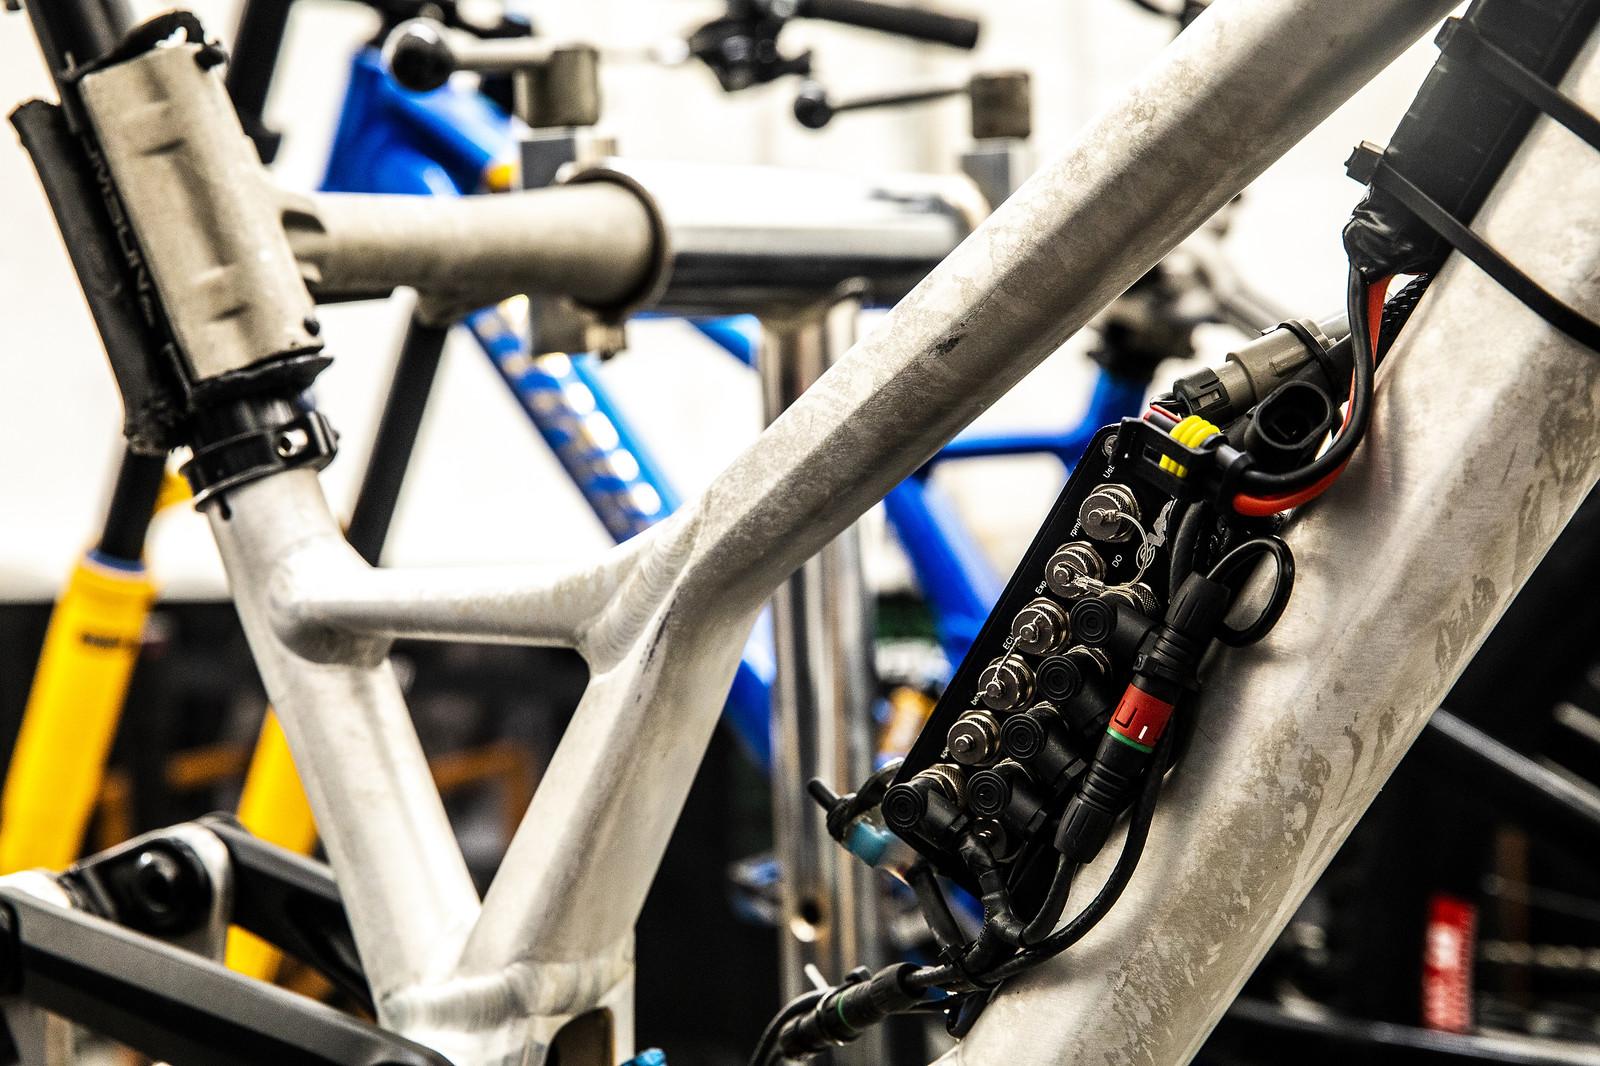 Loic Bruni's Data Bike - PIT BITS - 2019 Lenzerheide World Cup Downhill - Mountain Biking Pictures - Vital MTB